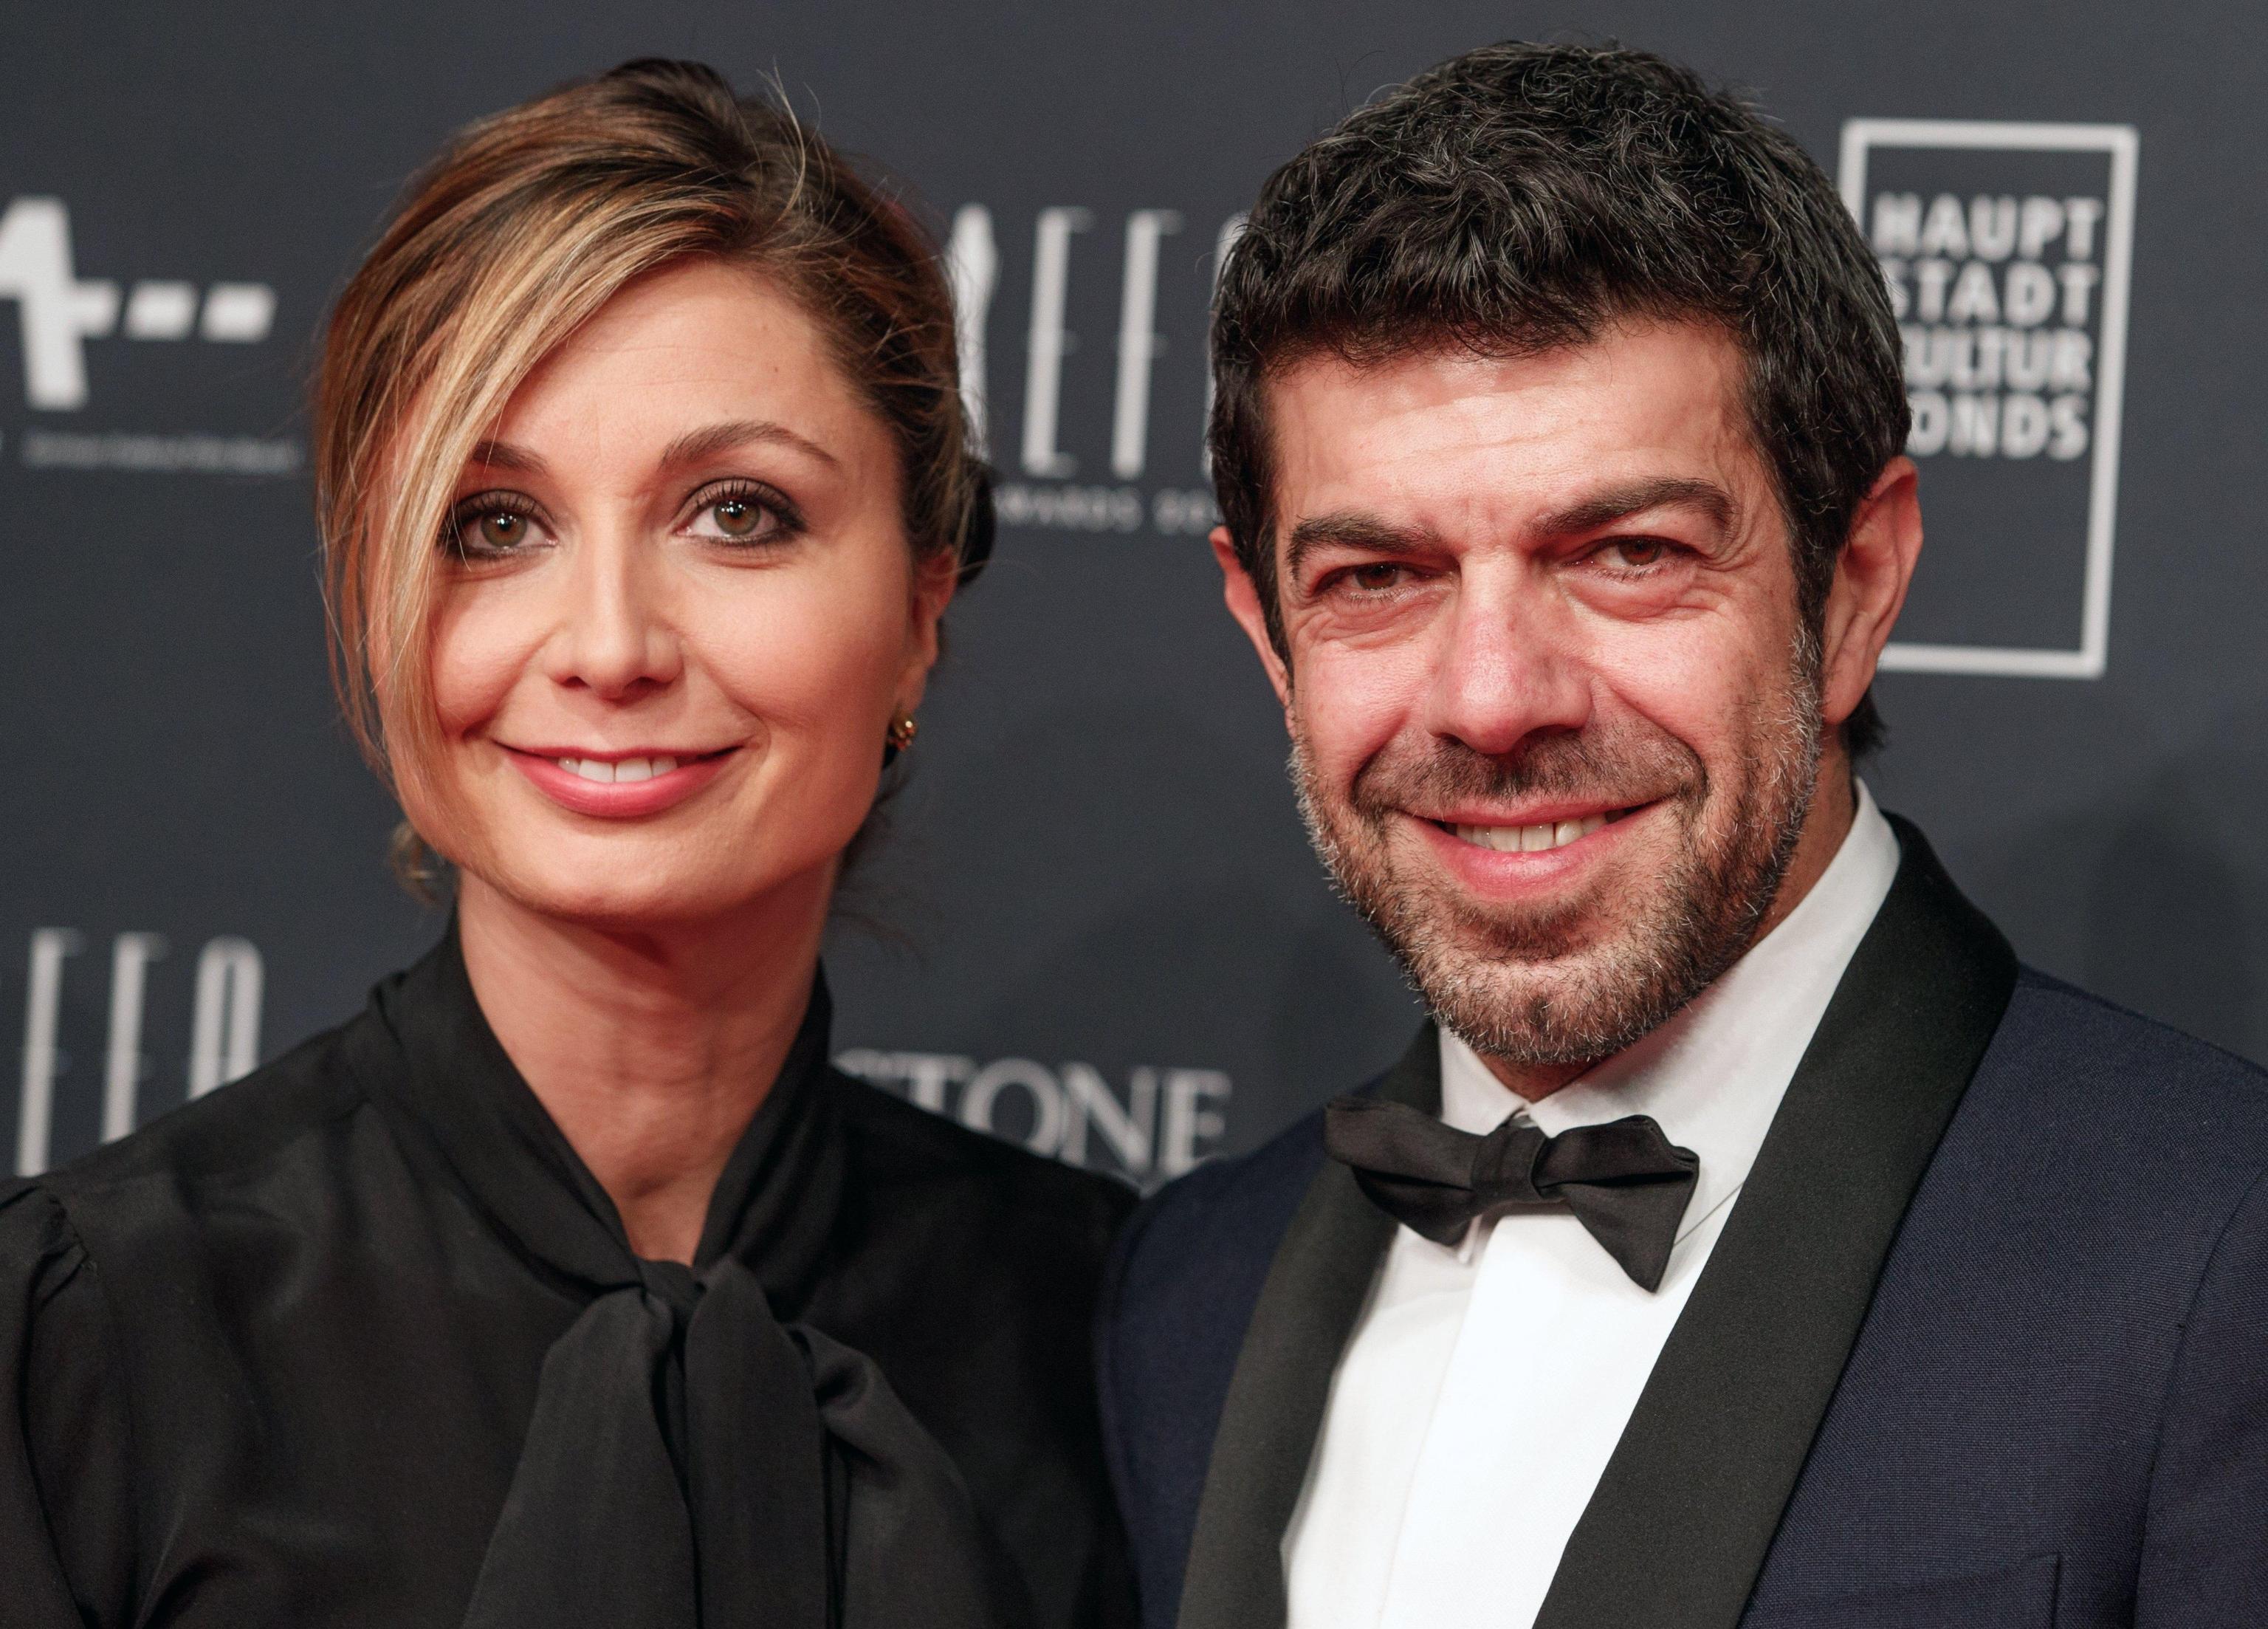 30th European Film Awards in Berlin